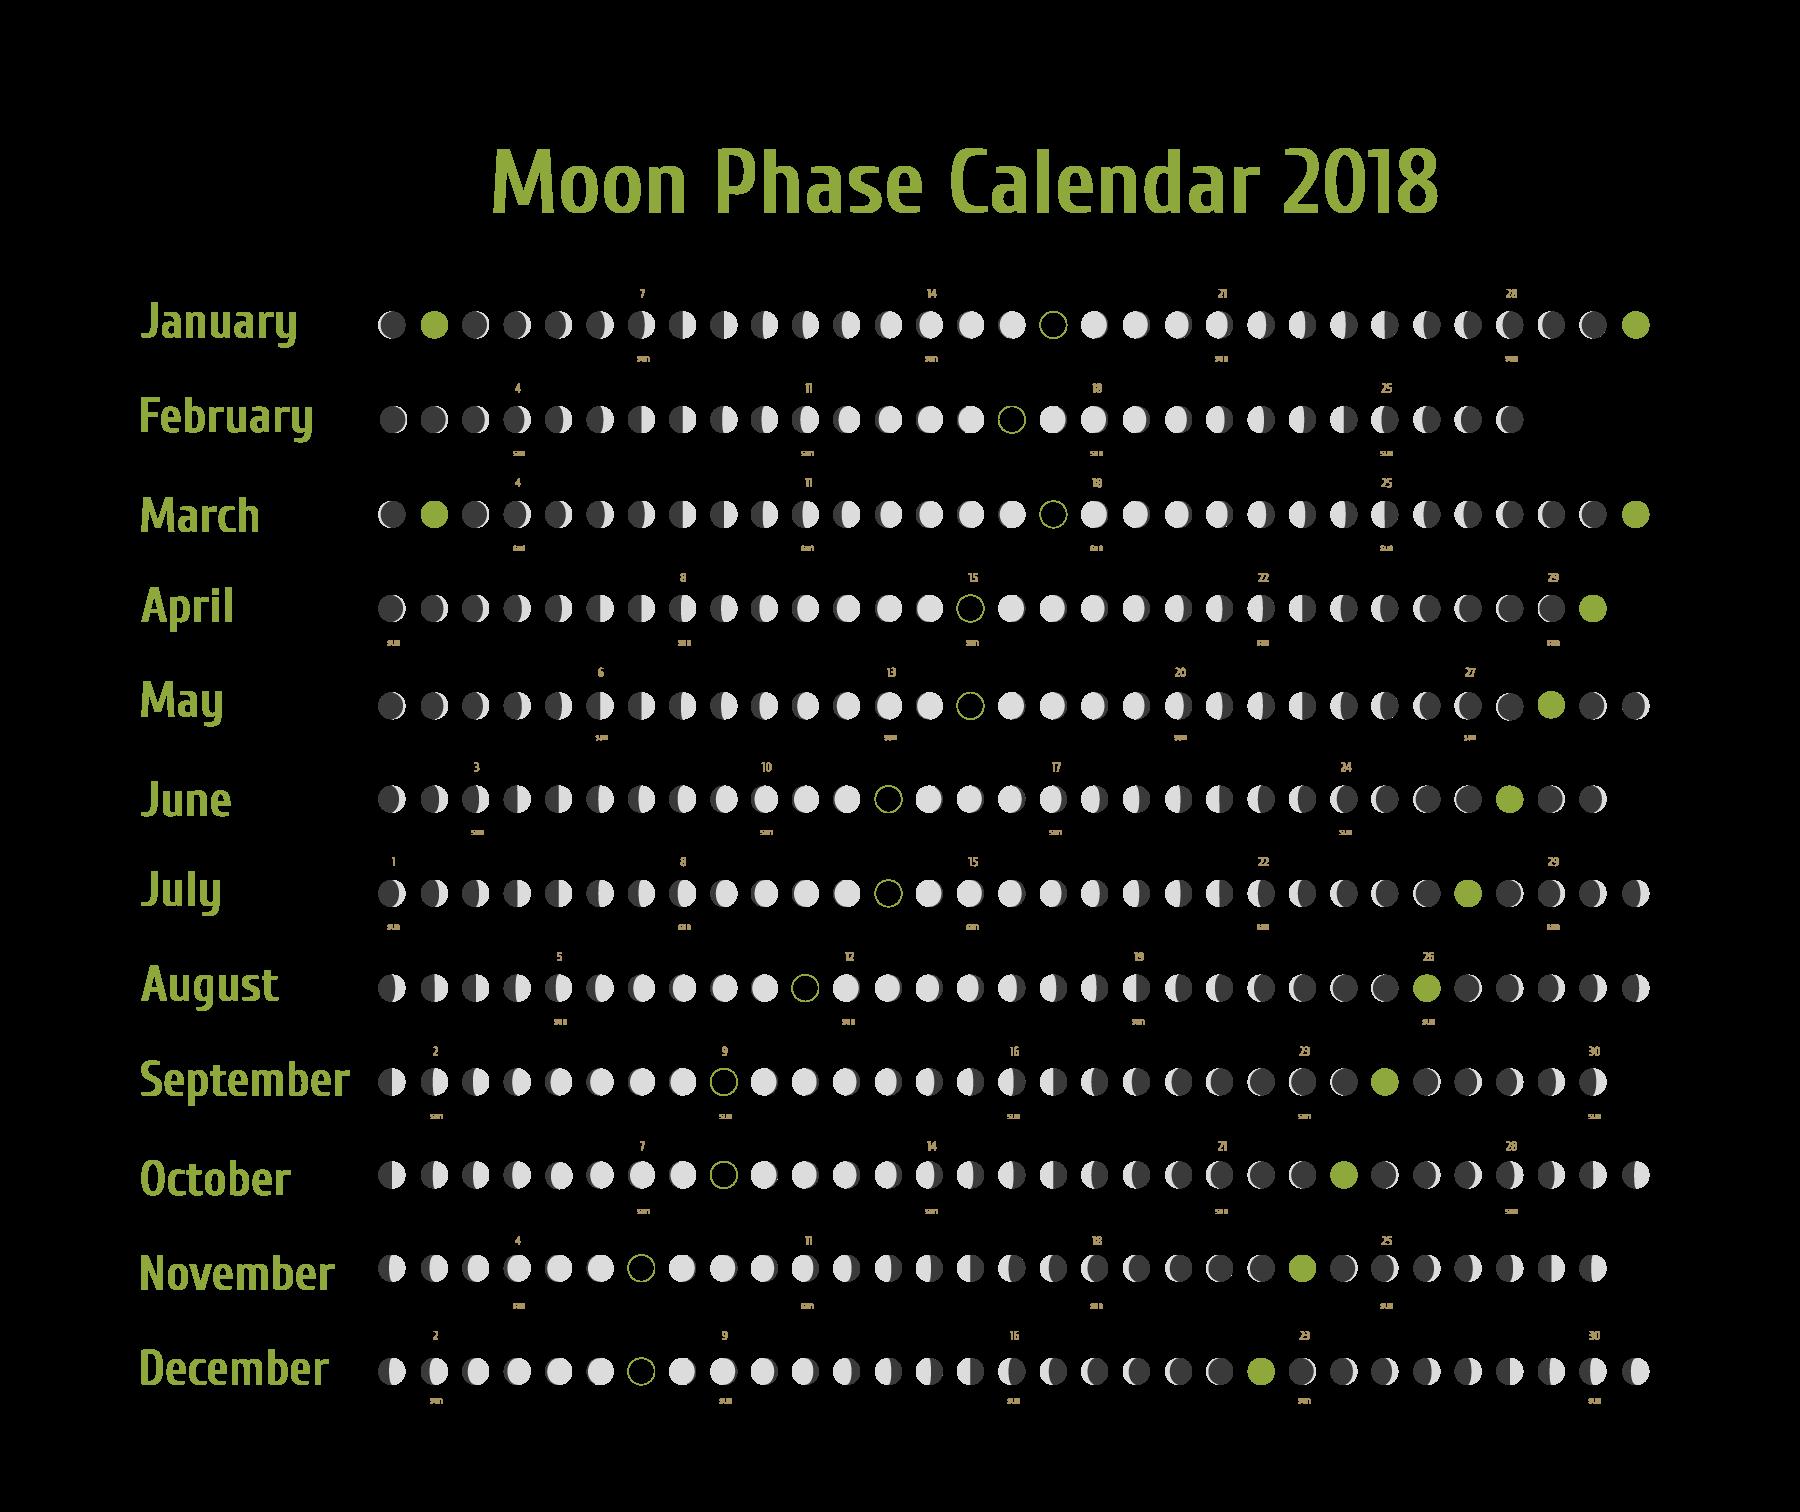 Moon Phase Calendar 2018